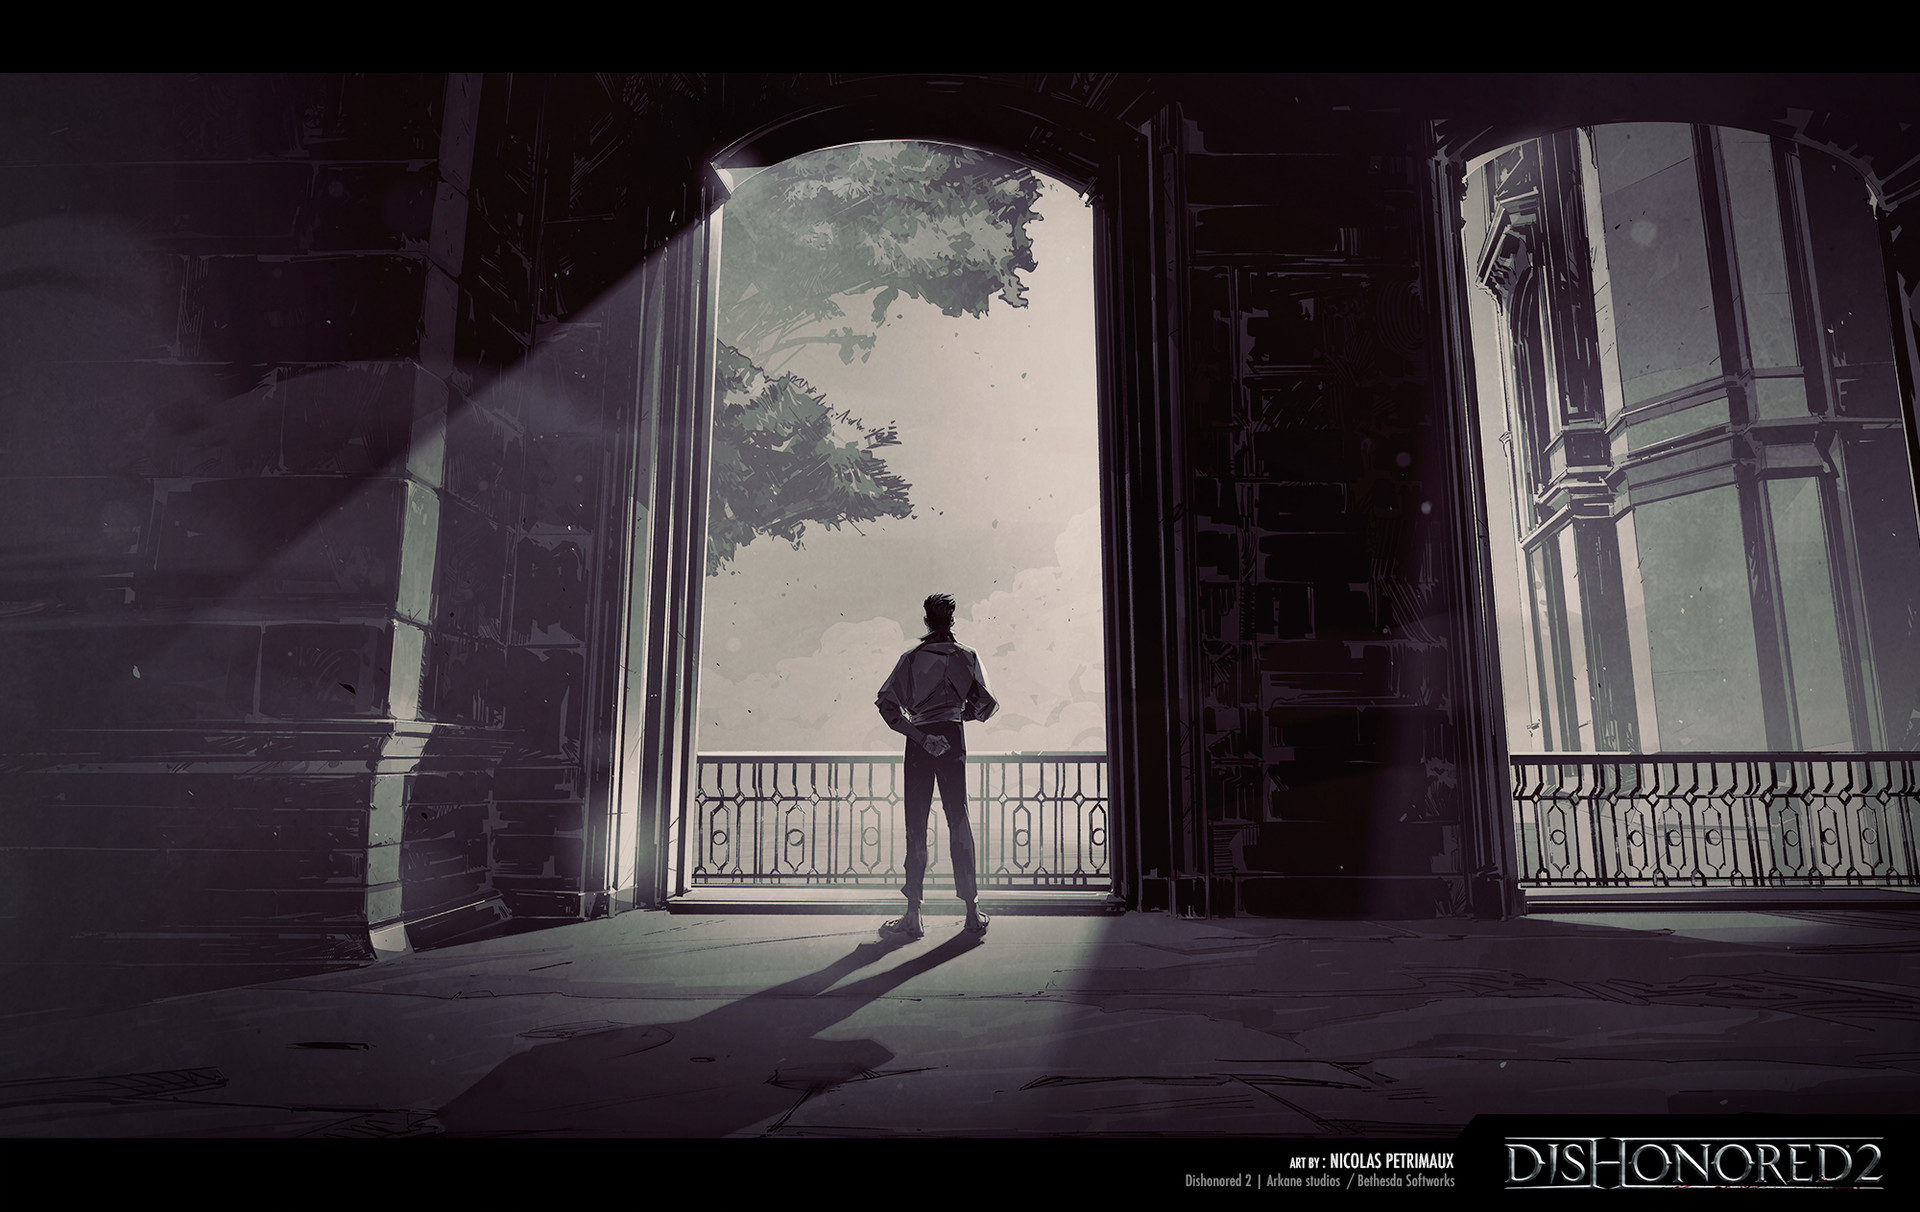 Nicolas petrimaux templatecredit dishonored2 mad01